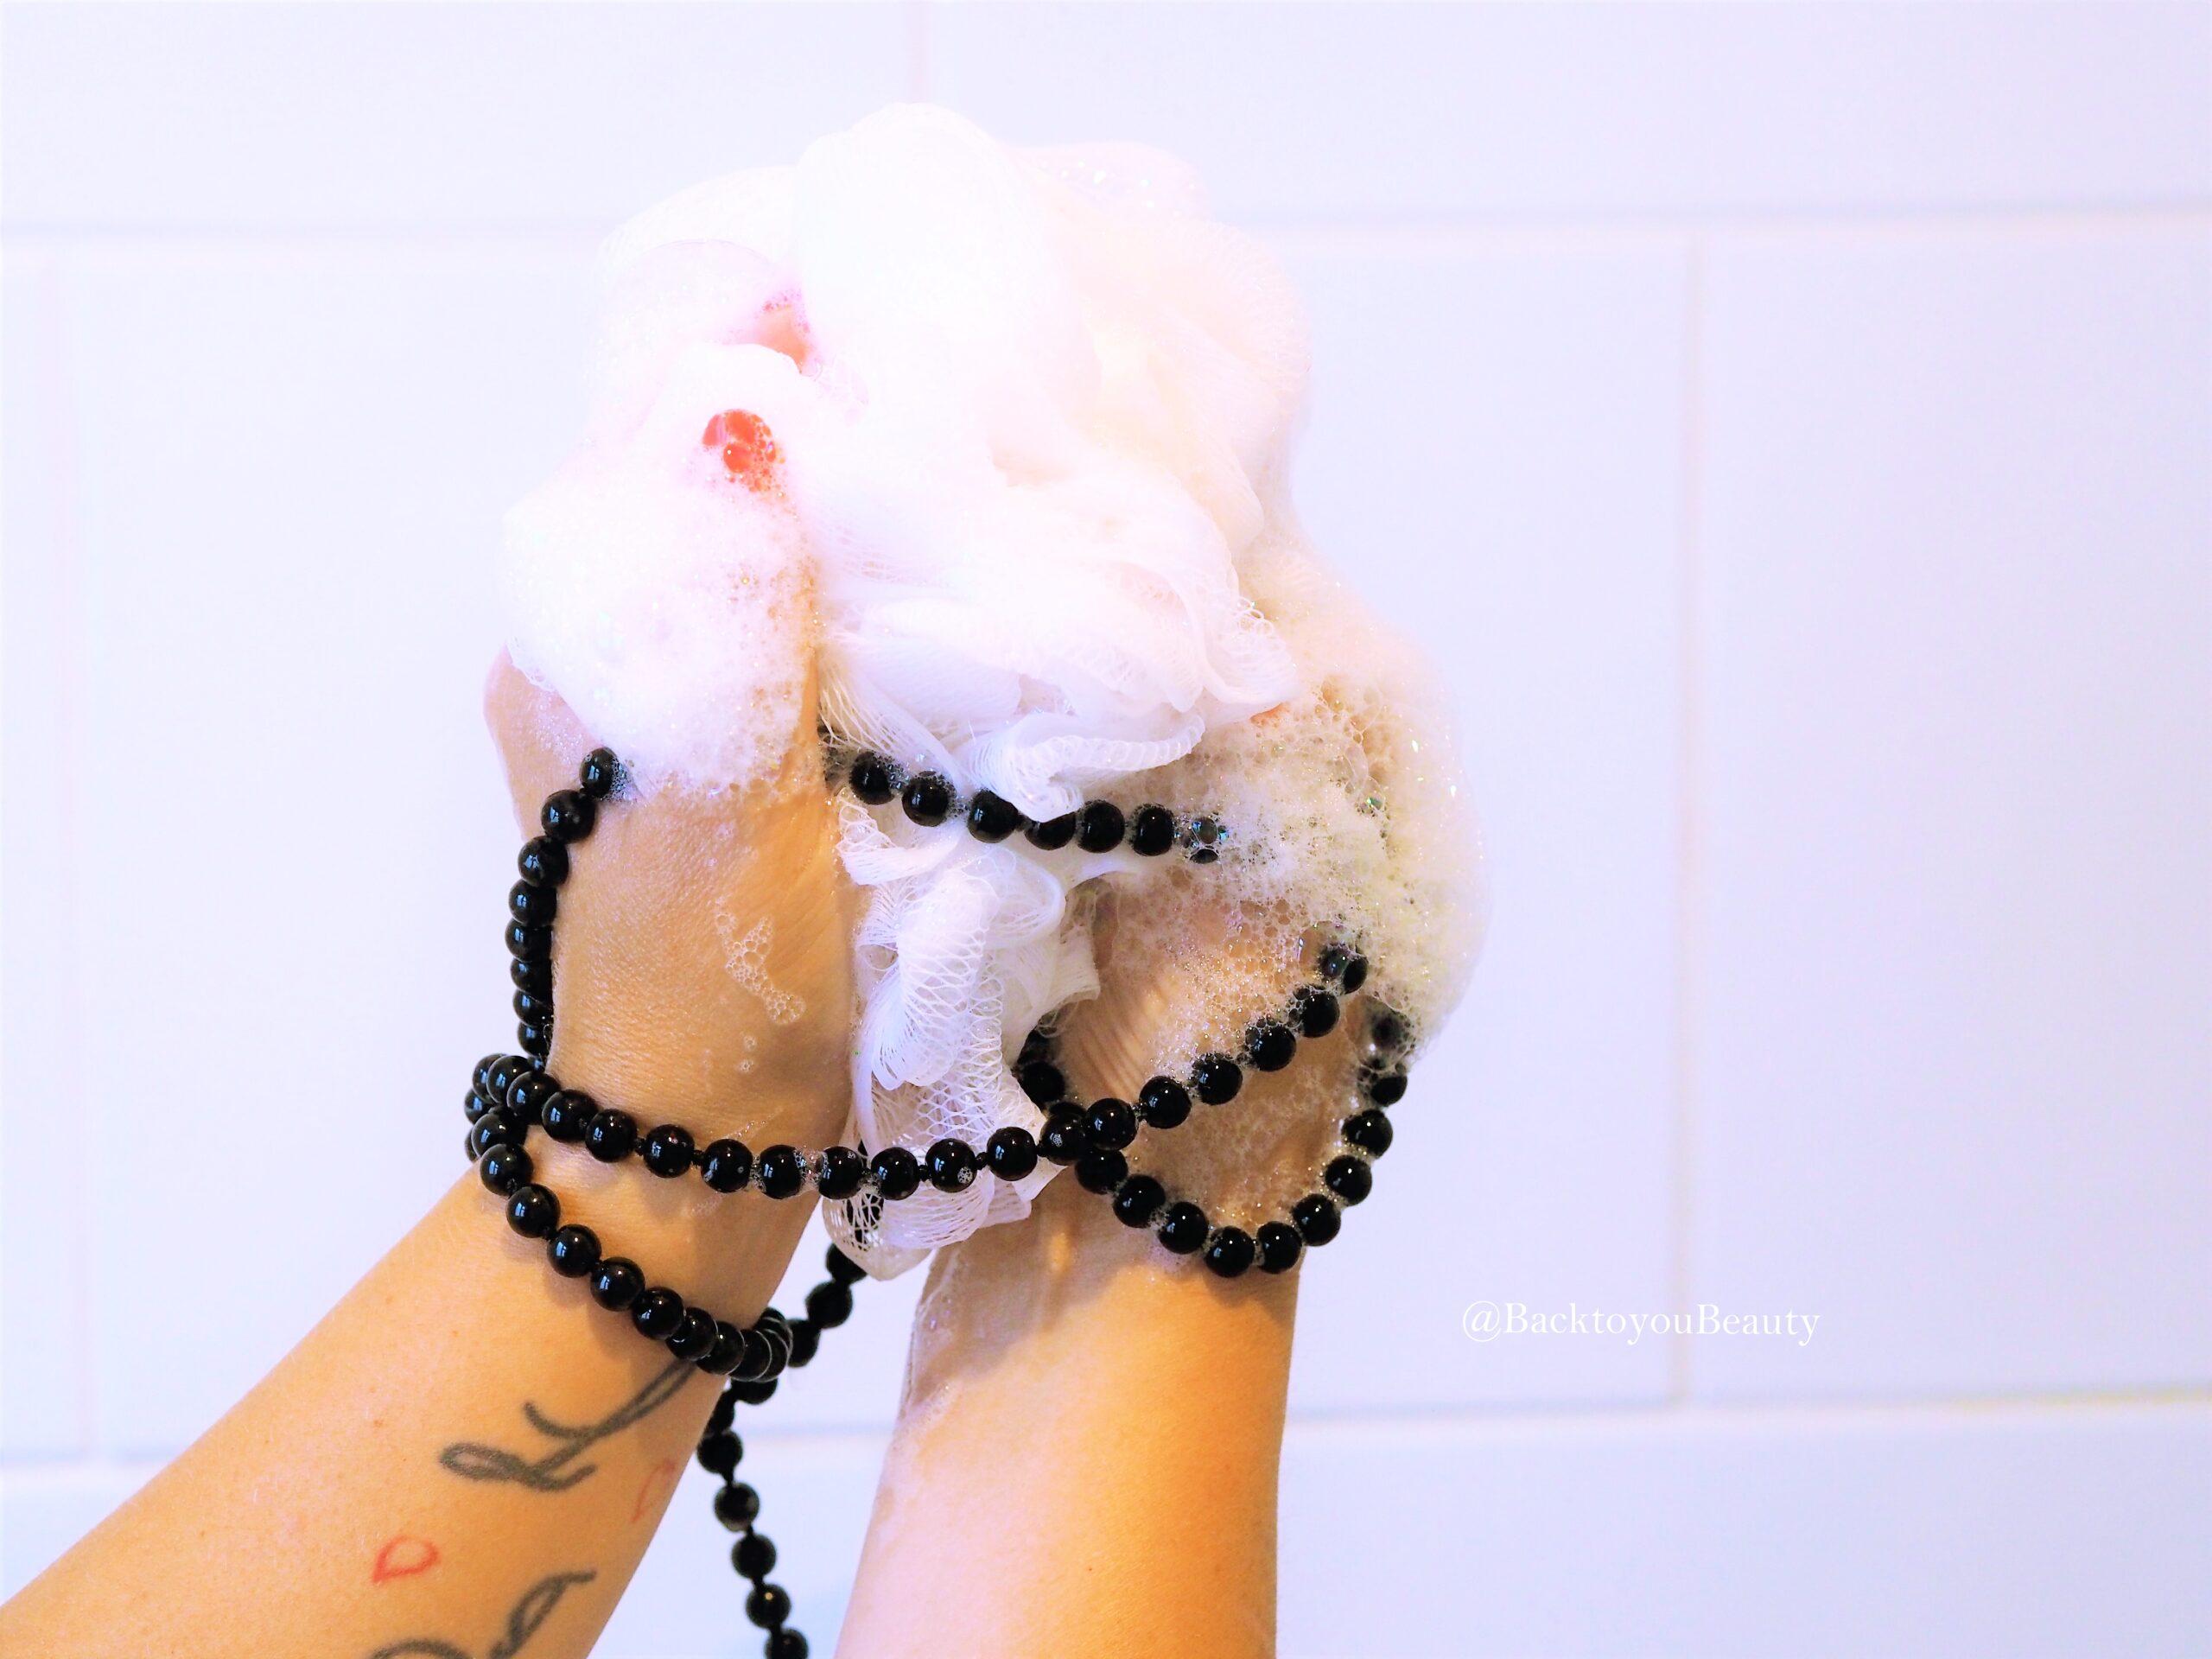 SBC Hydra Collagen and black pearl bodywash use